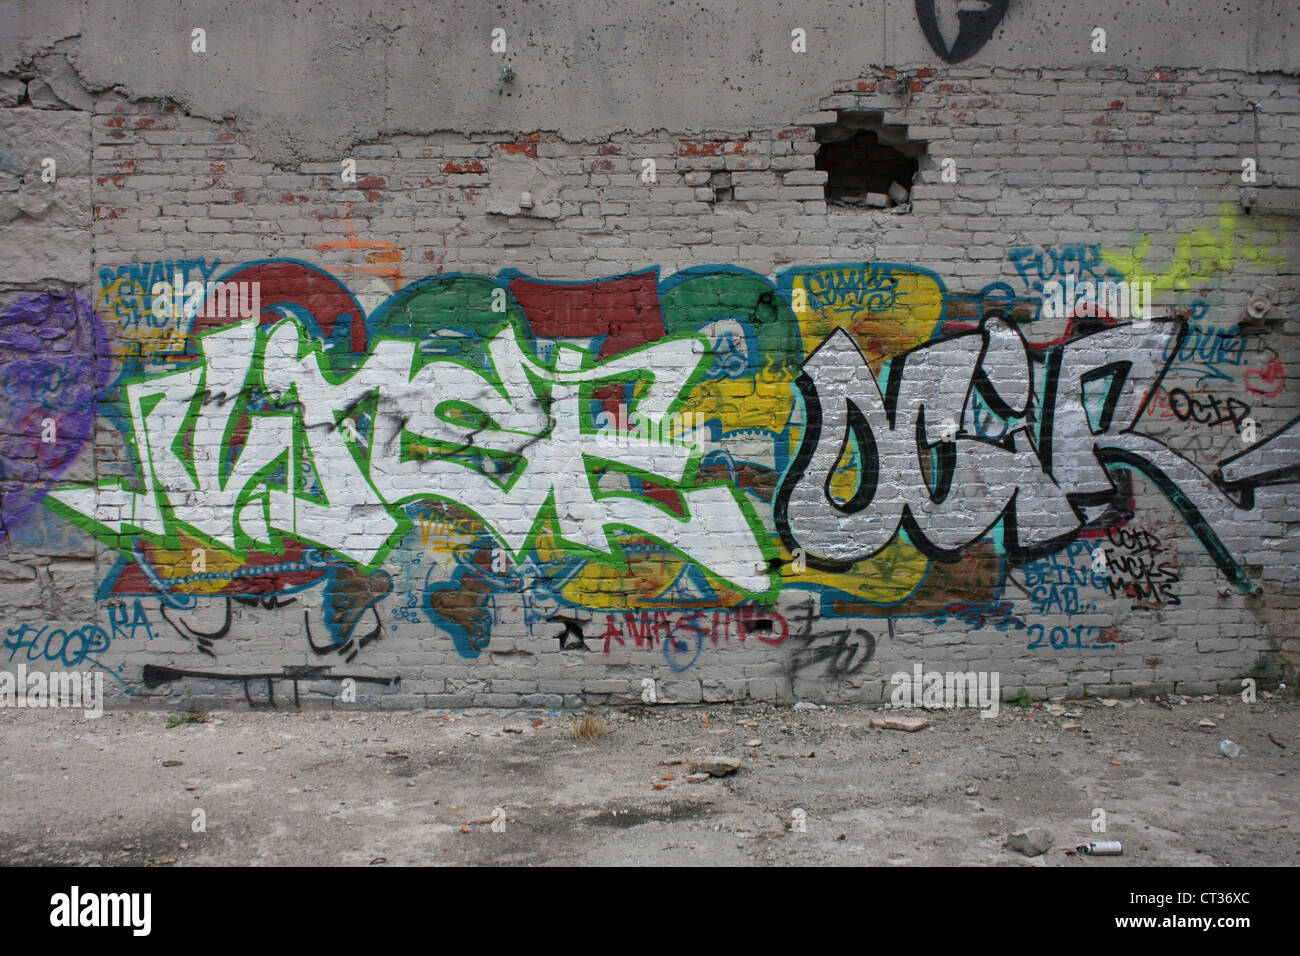 graffiti art brick wall vandalism - Stock Image